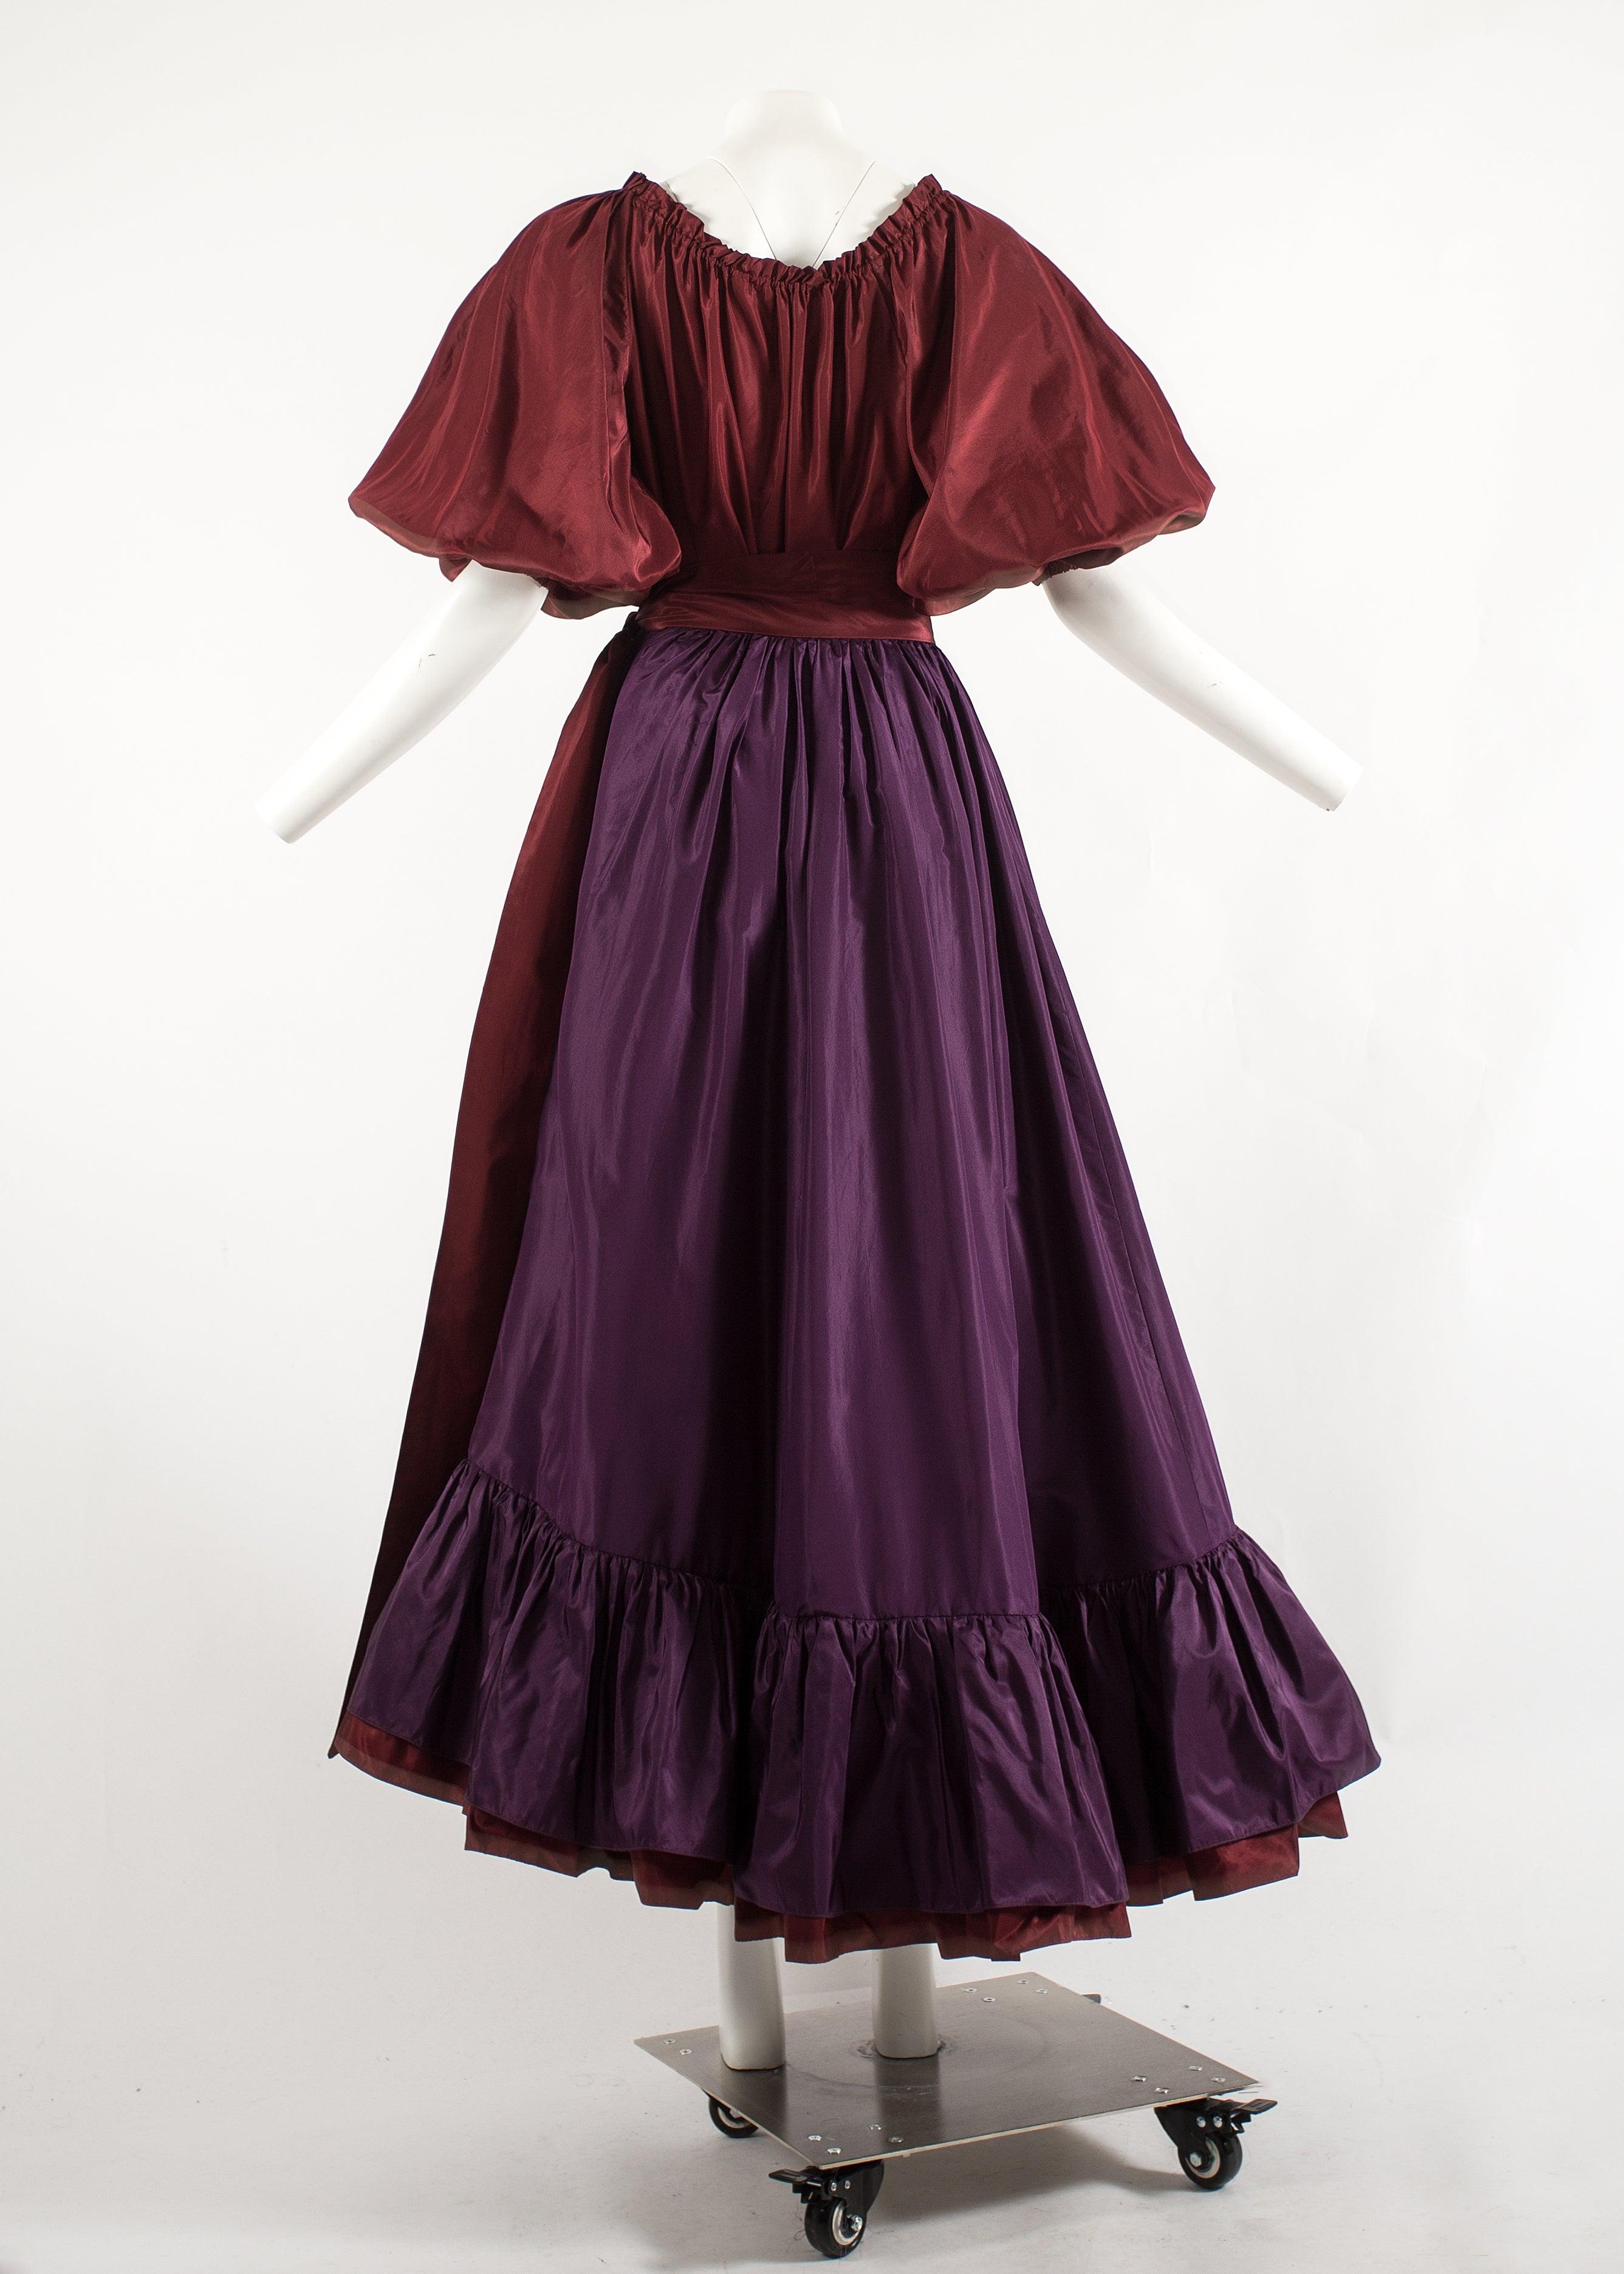 3b4a6b859c5 Yves Saint Laurent 1978 silk taffeta blouse and skirt ensemble For Sale at  1stdibs